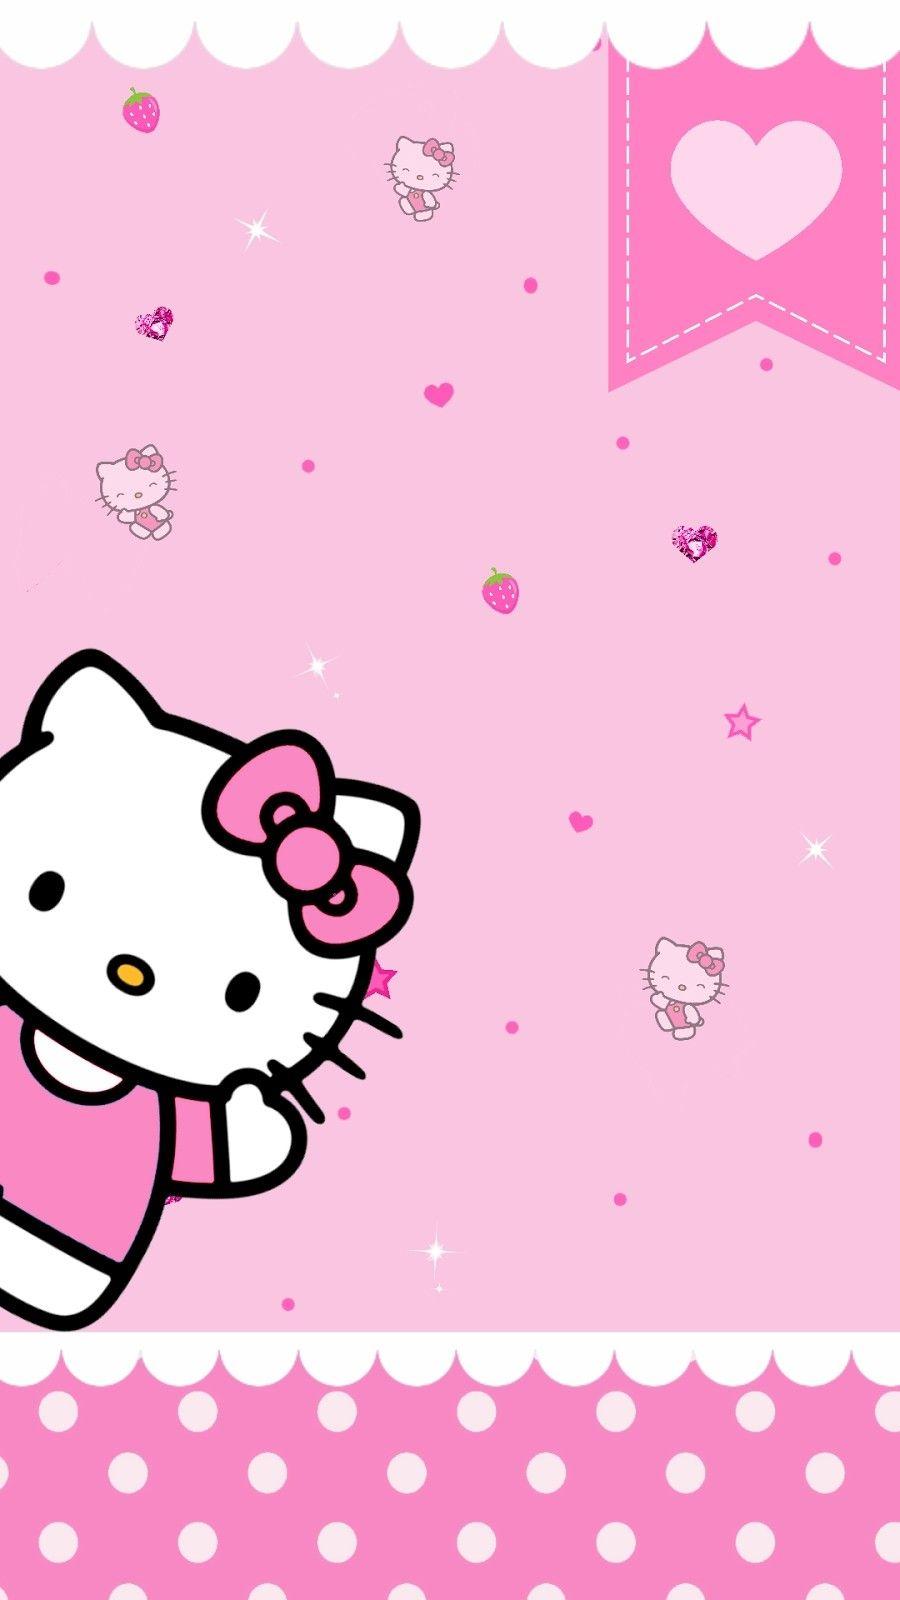 Pin by Terra Thayer on Hello Kitty Hello kitty